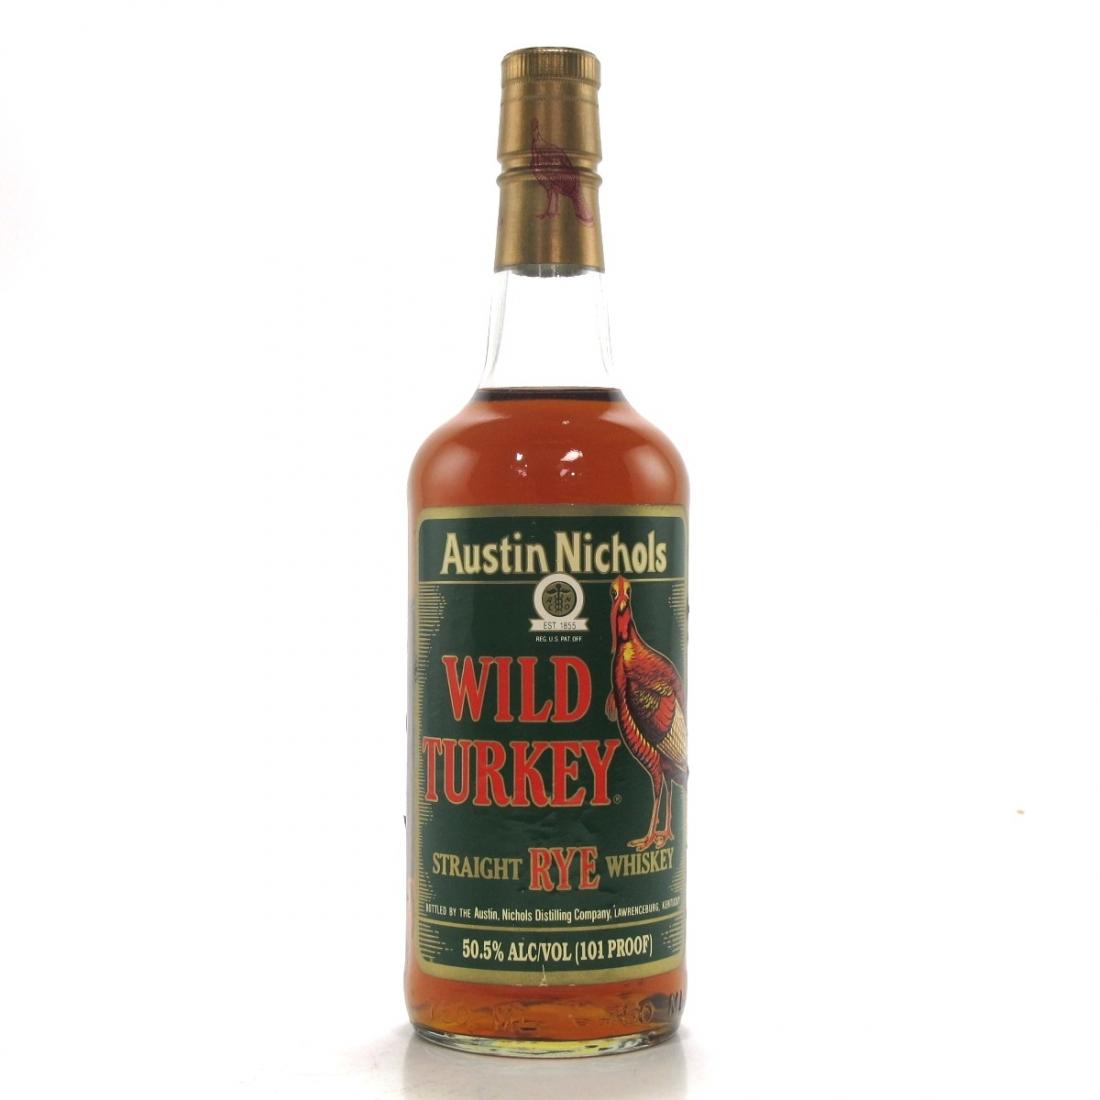 Wild Turkey 101 Proof Straight Rye / Christmas Rye